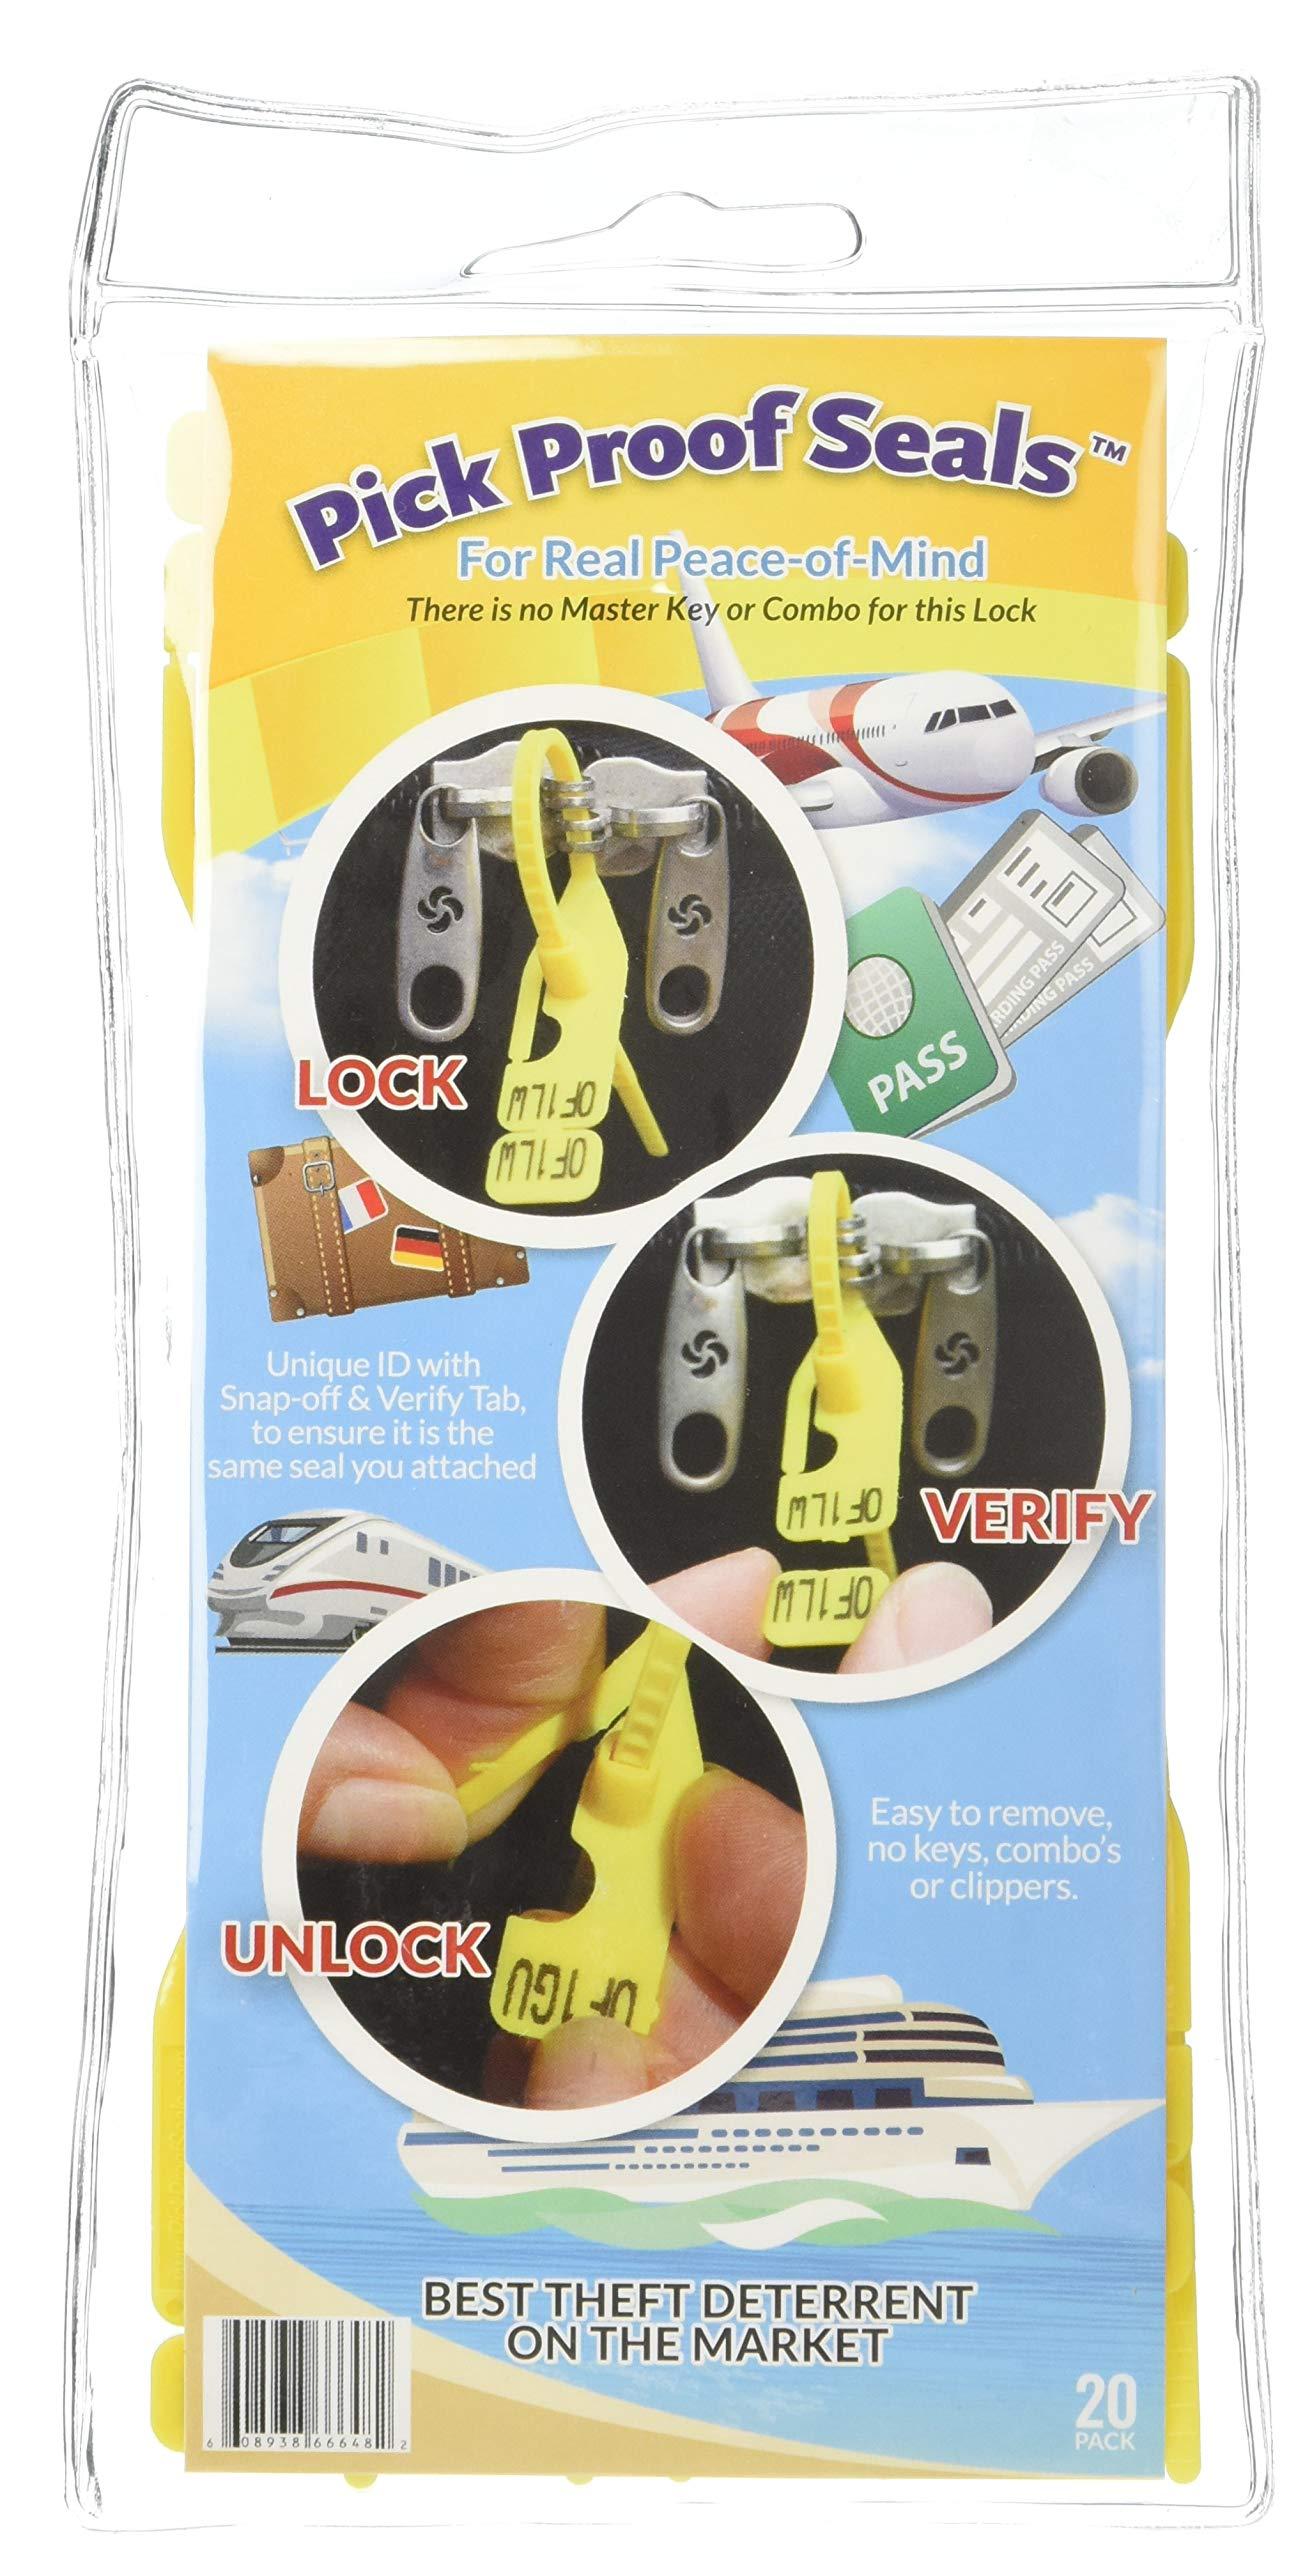 Pick Proof Seals - TSA Accepted Luggage Locks (3 Packs = 60 Total Seals)